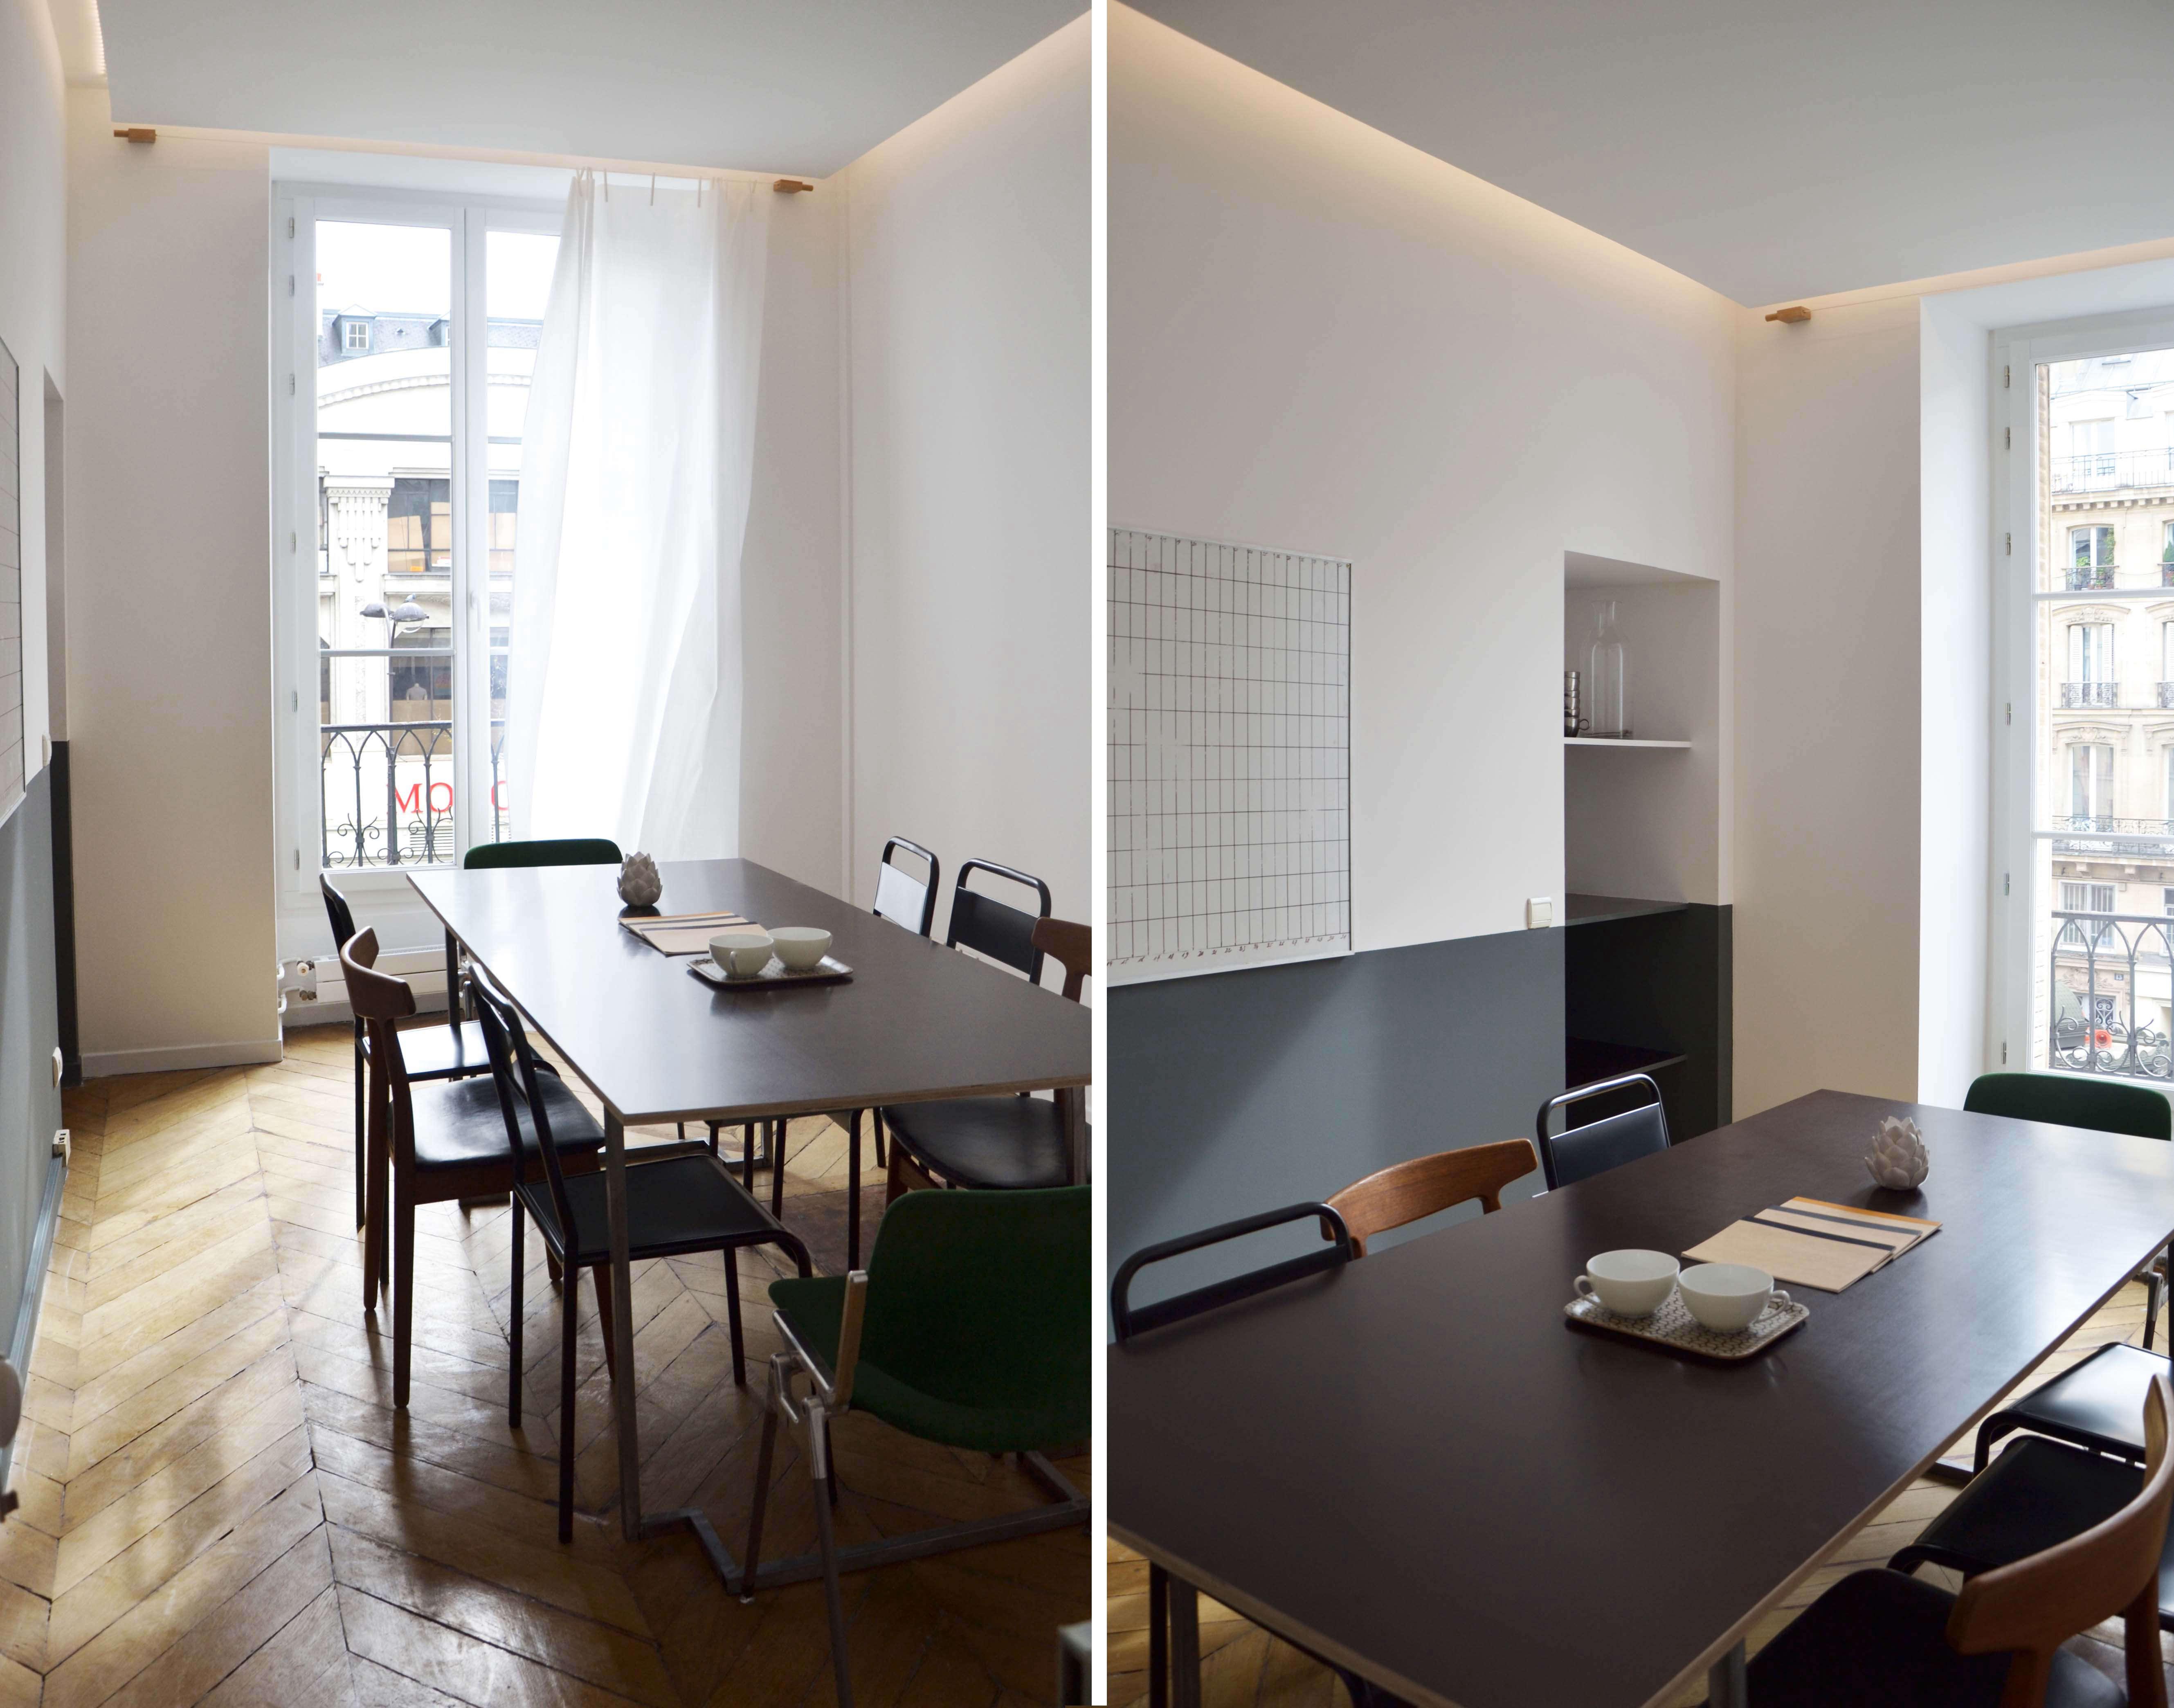 Trend Alert 5 Shared Workspaces Gone Upscale Coworking Room at Artichaut Paris